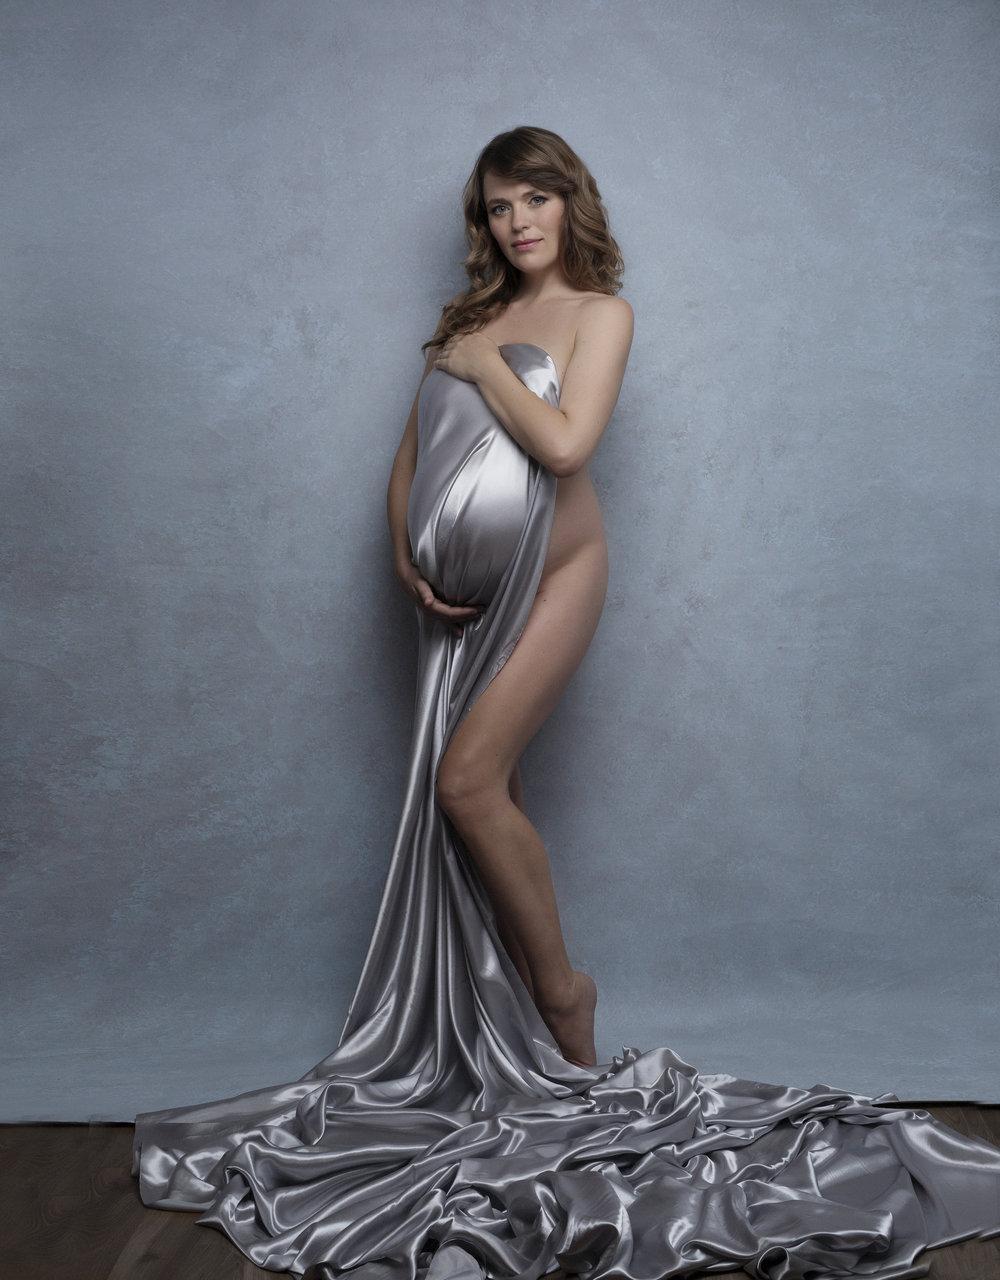 Artistic maternity photo-session with Liliya Lubenkova Portraits.